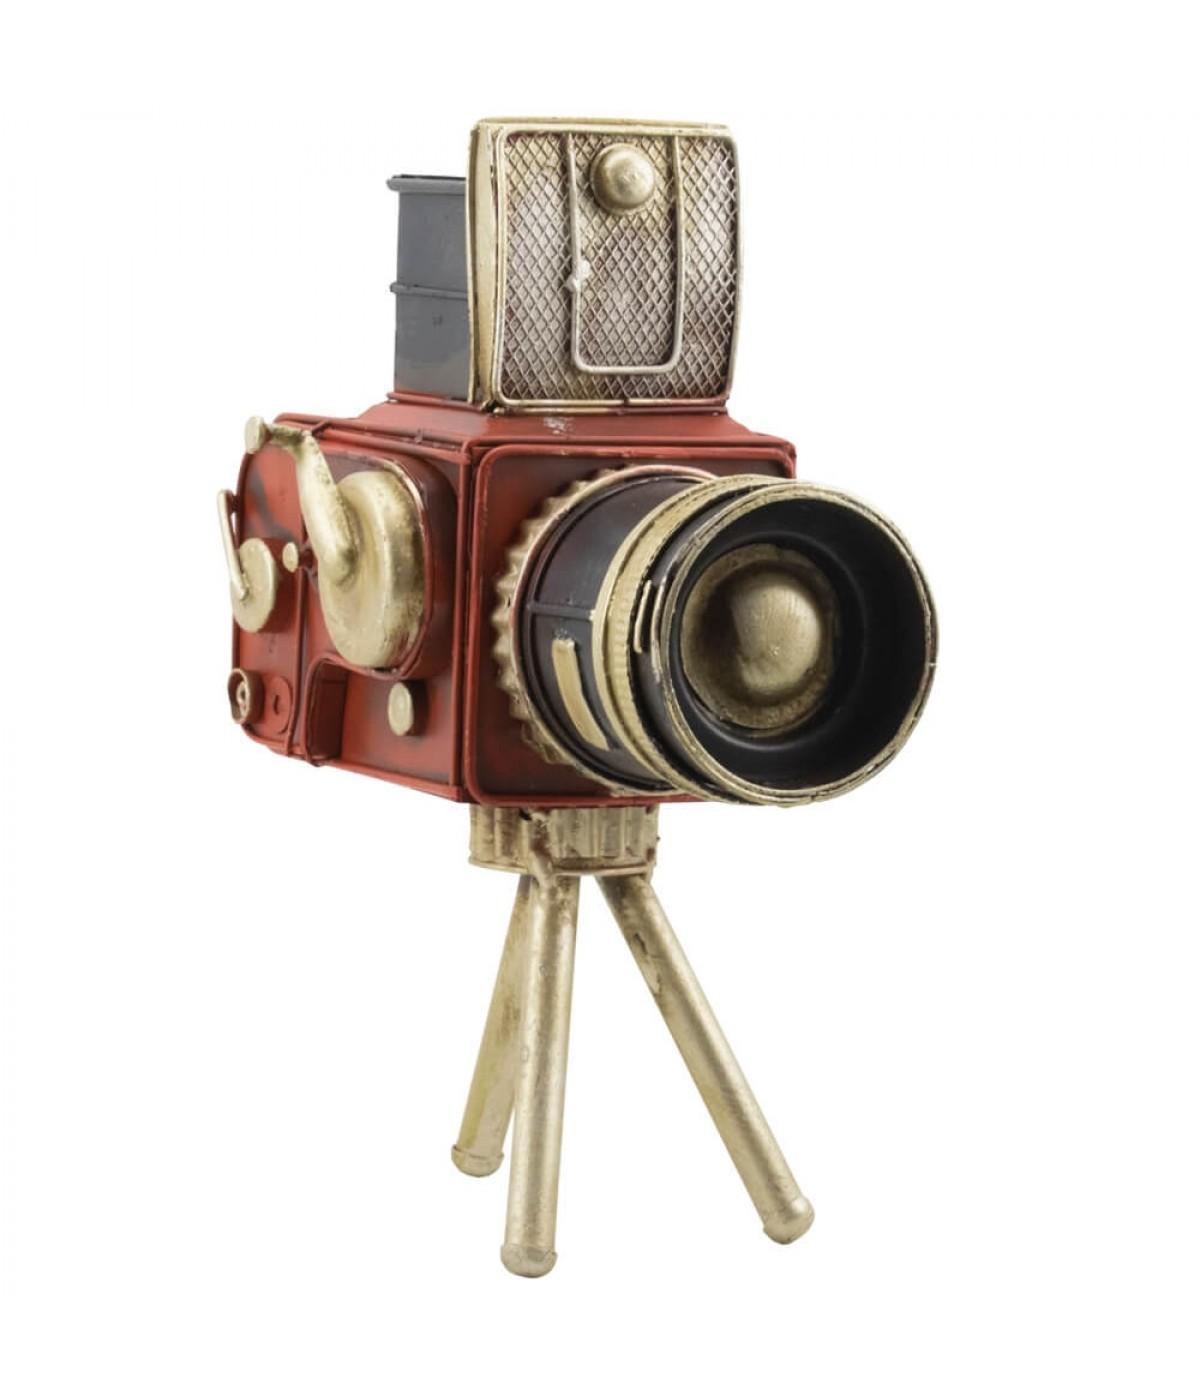 Filmadora Com Tripé 22.5cm Estilo Retrô - Vintage